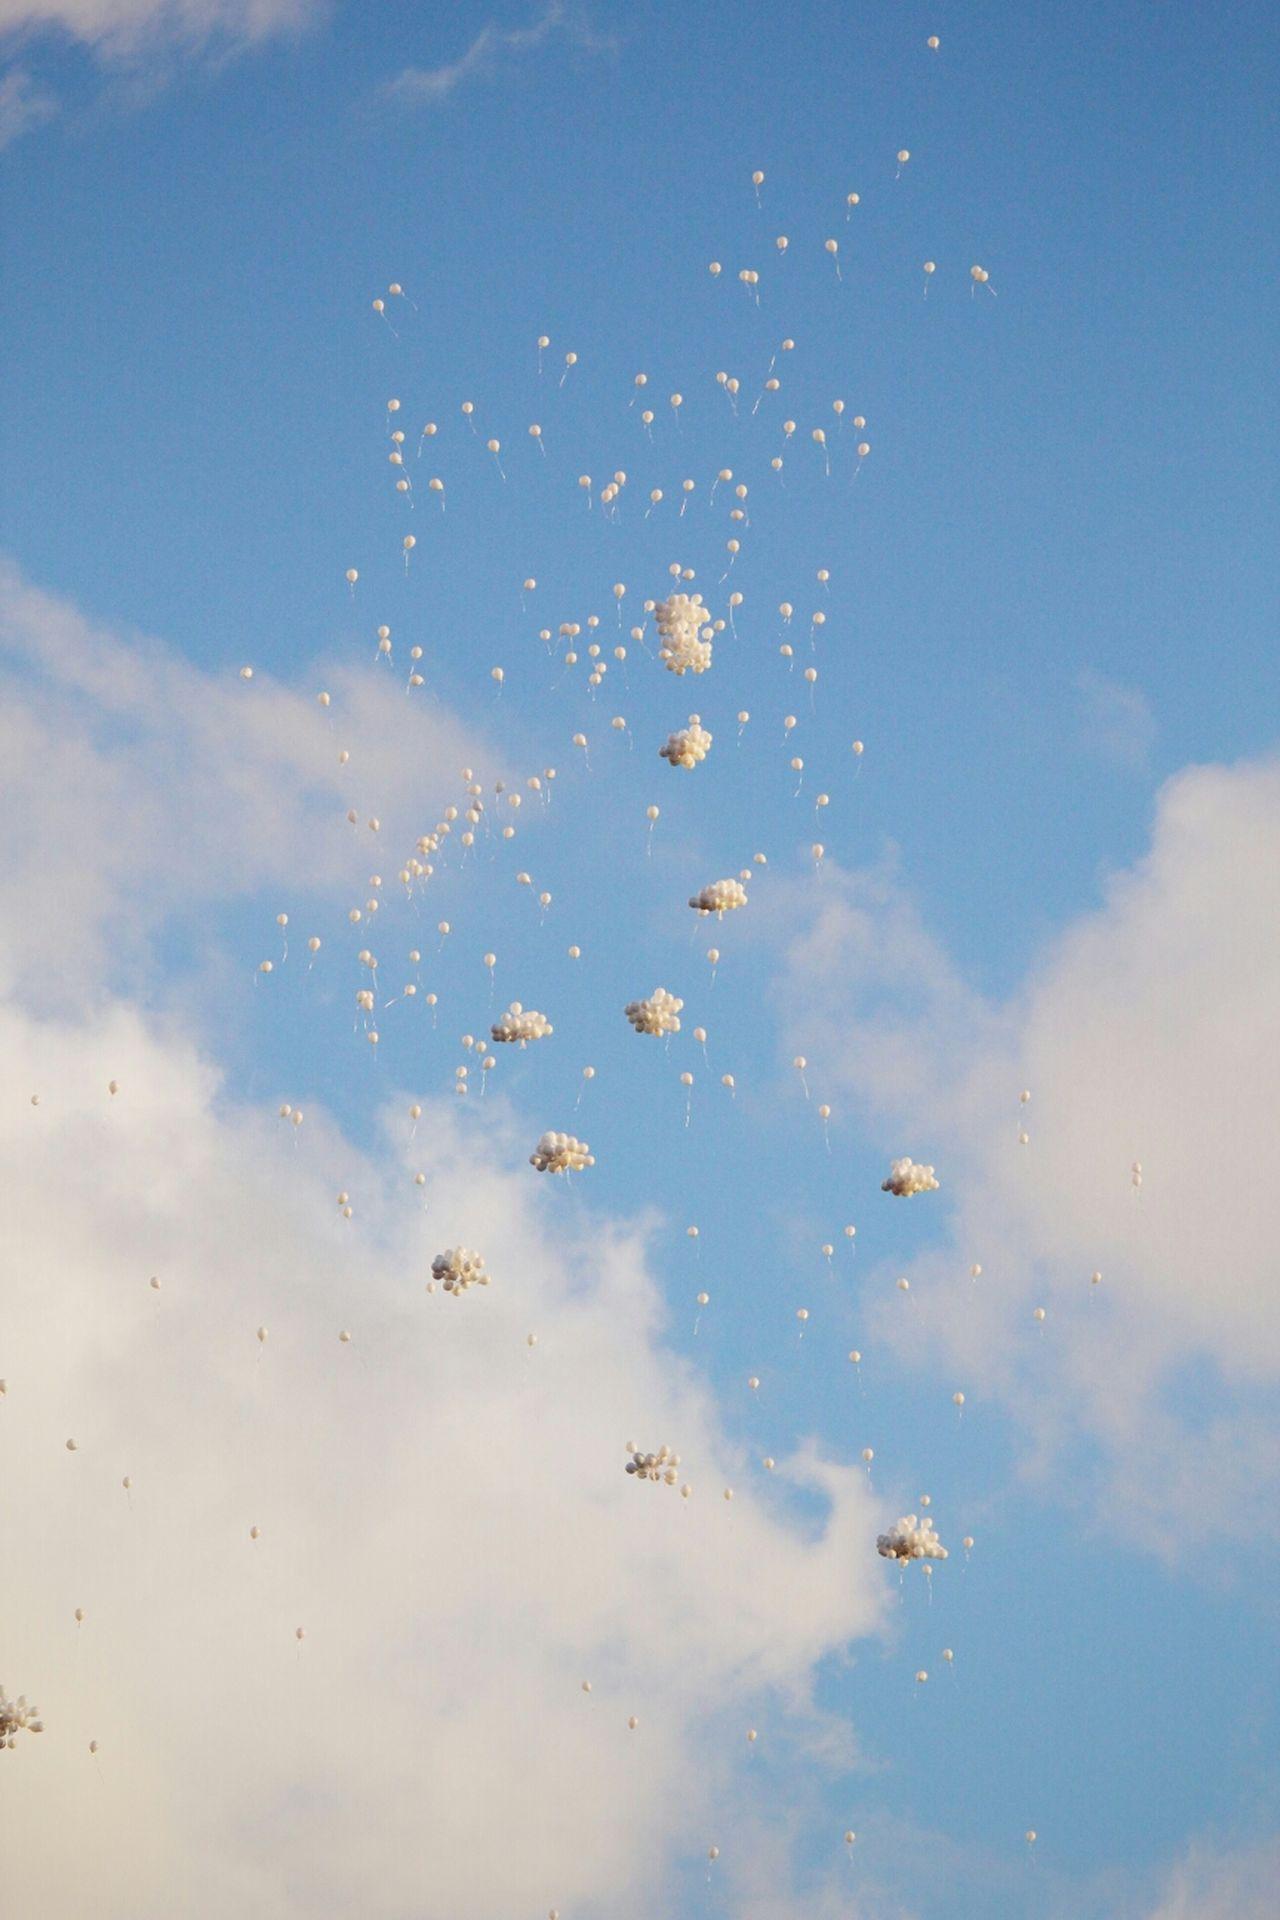 Balloons Sky Clouds Canon